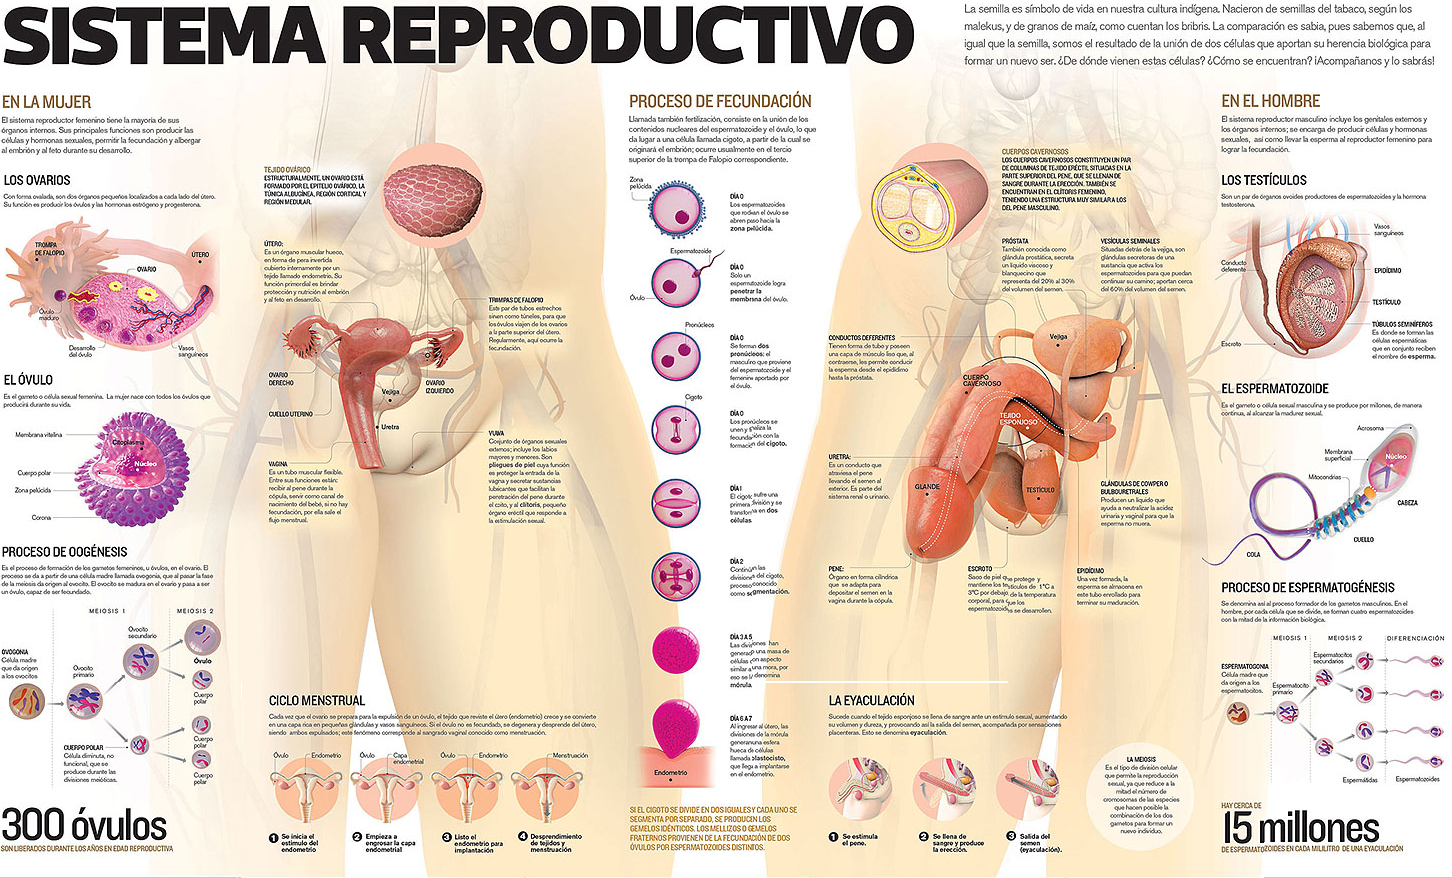 Morfofisiologia3c: APARATO REPRODUCTOR MASCULINO